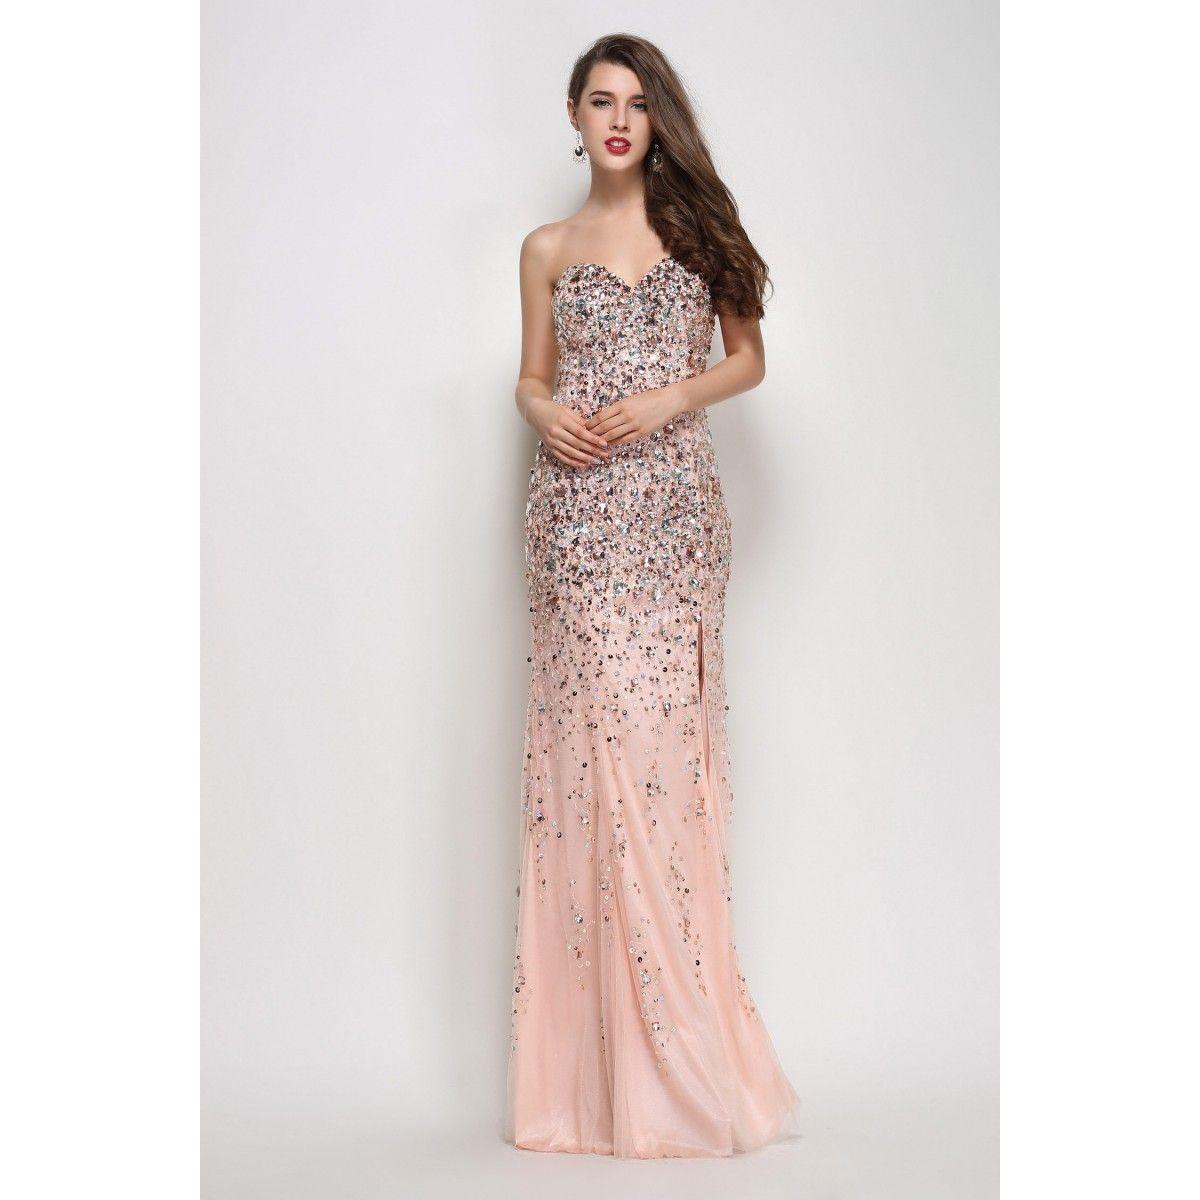 Pink Beaded Exclusive Mermaid Prom Dress Winter Formal Dress